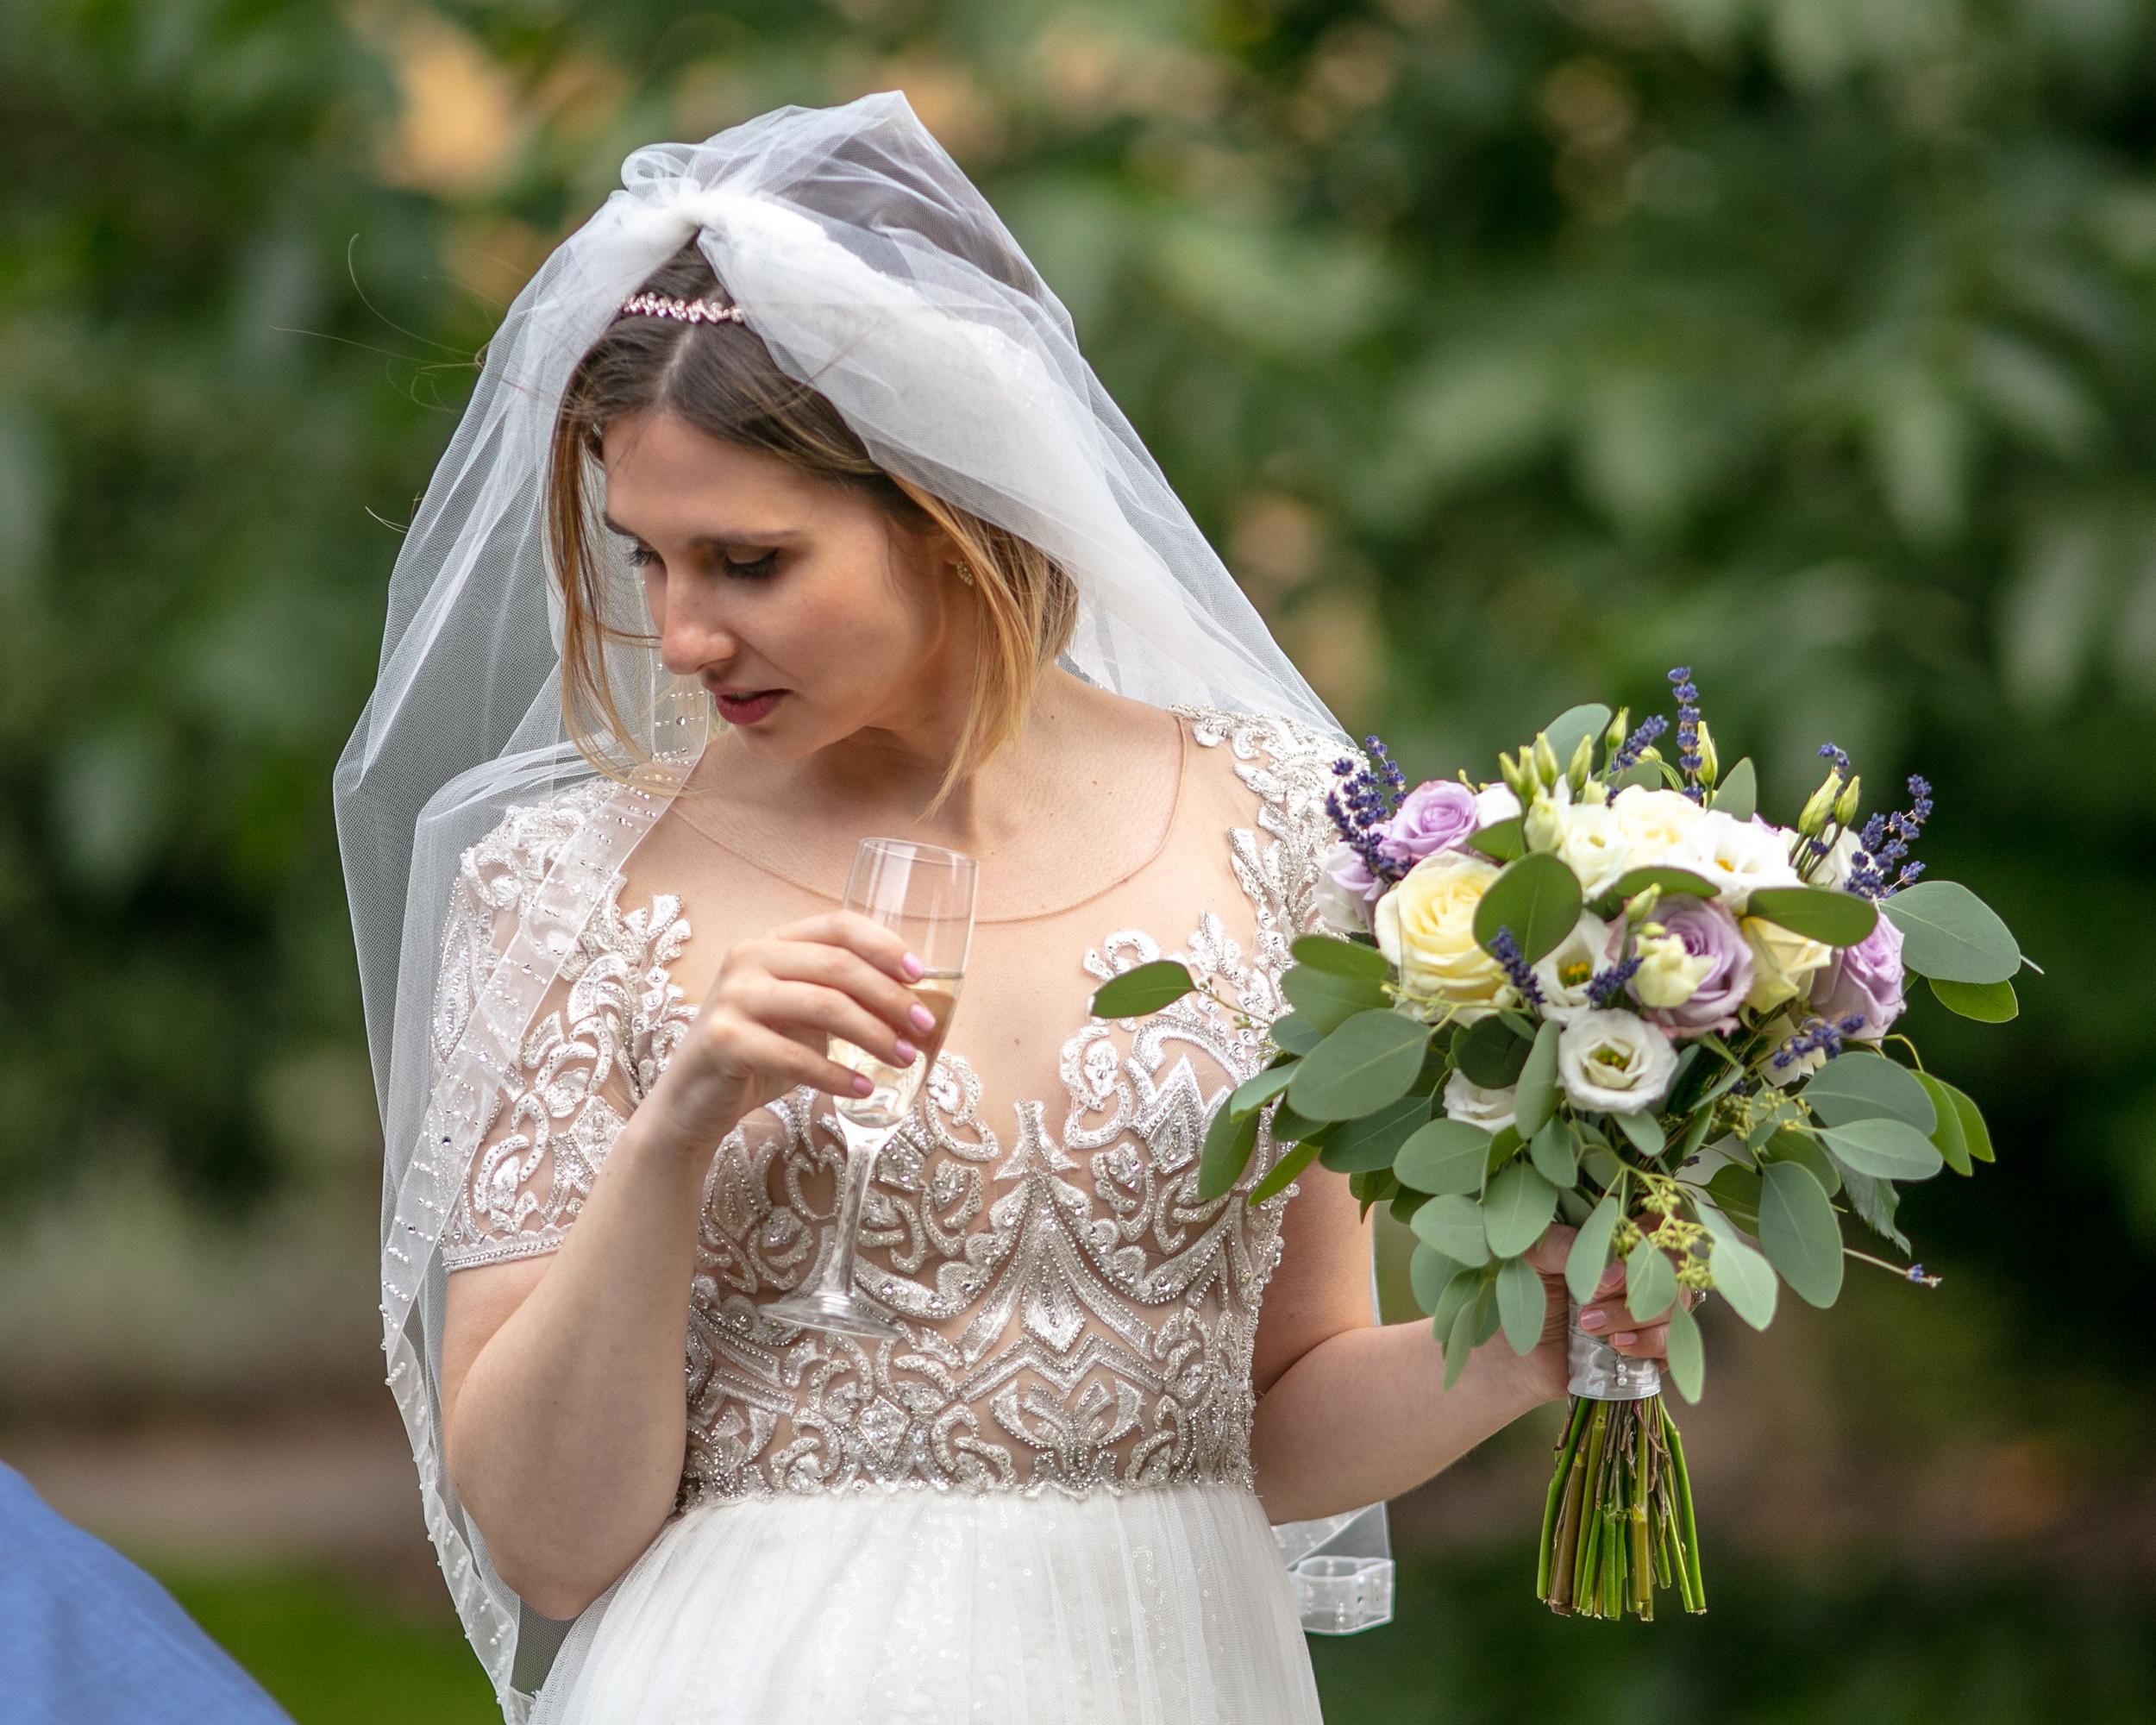 Charringworth-Manor-Wedding-Photography20.jpg